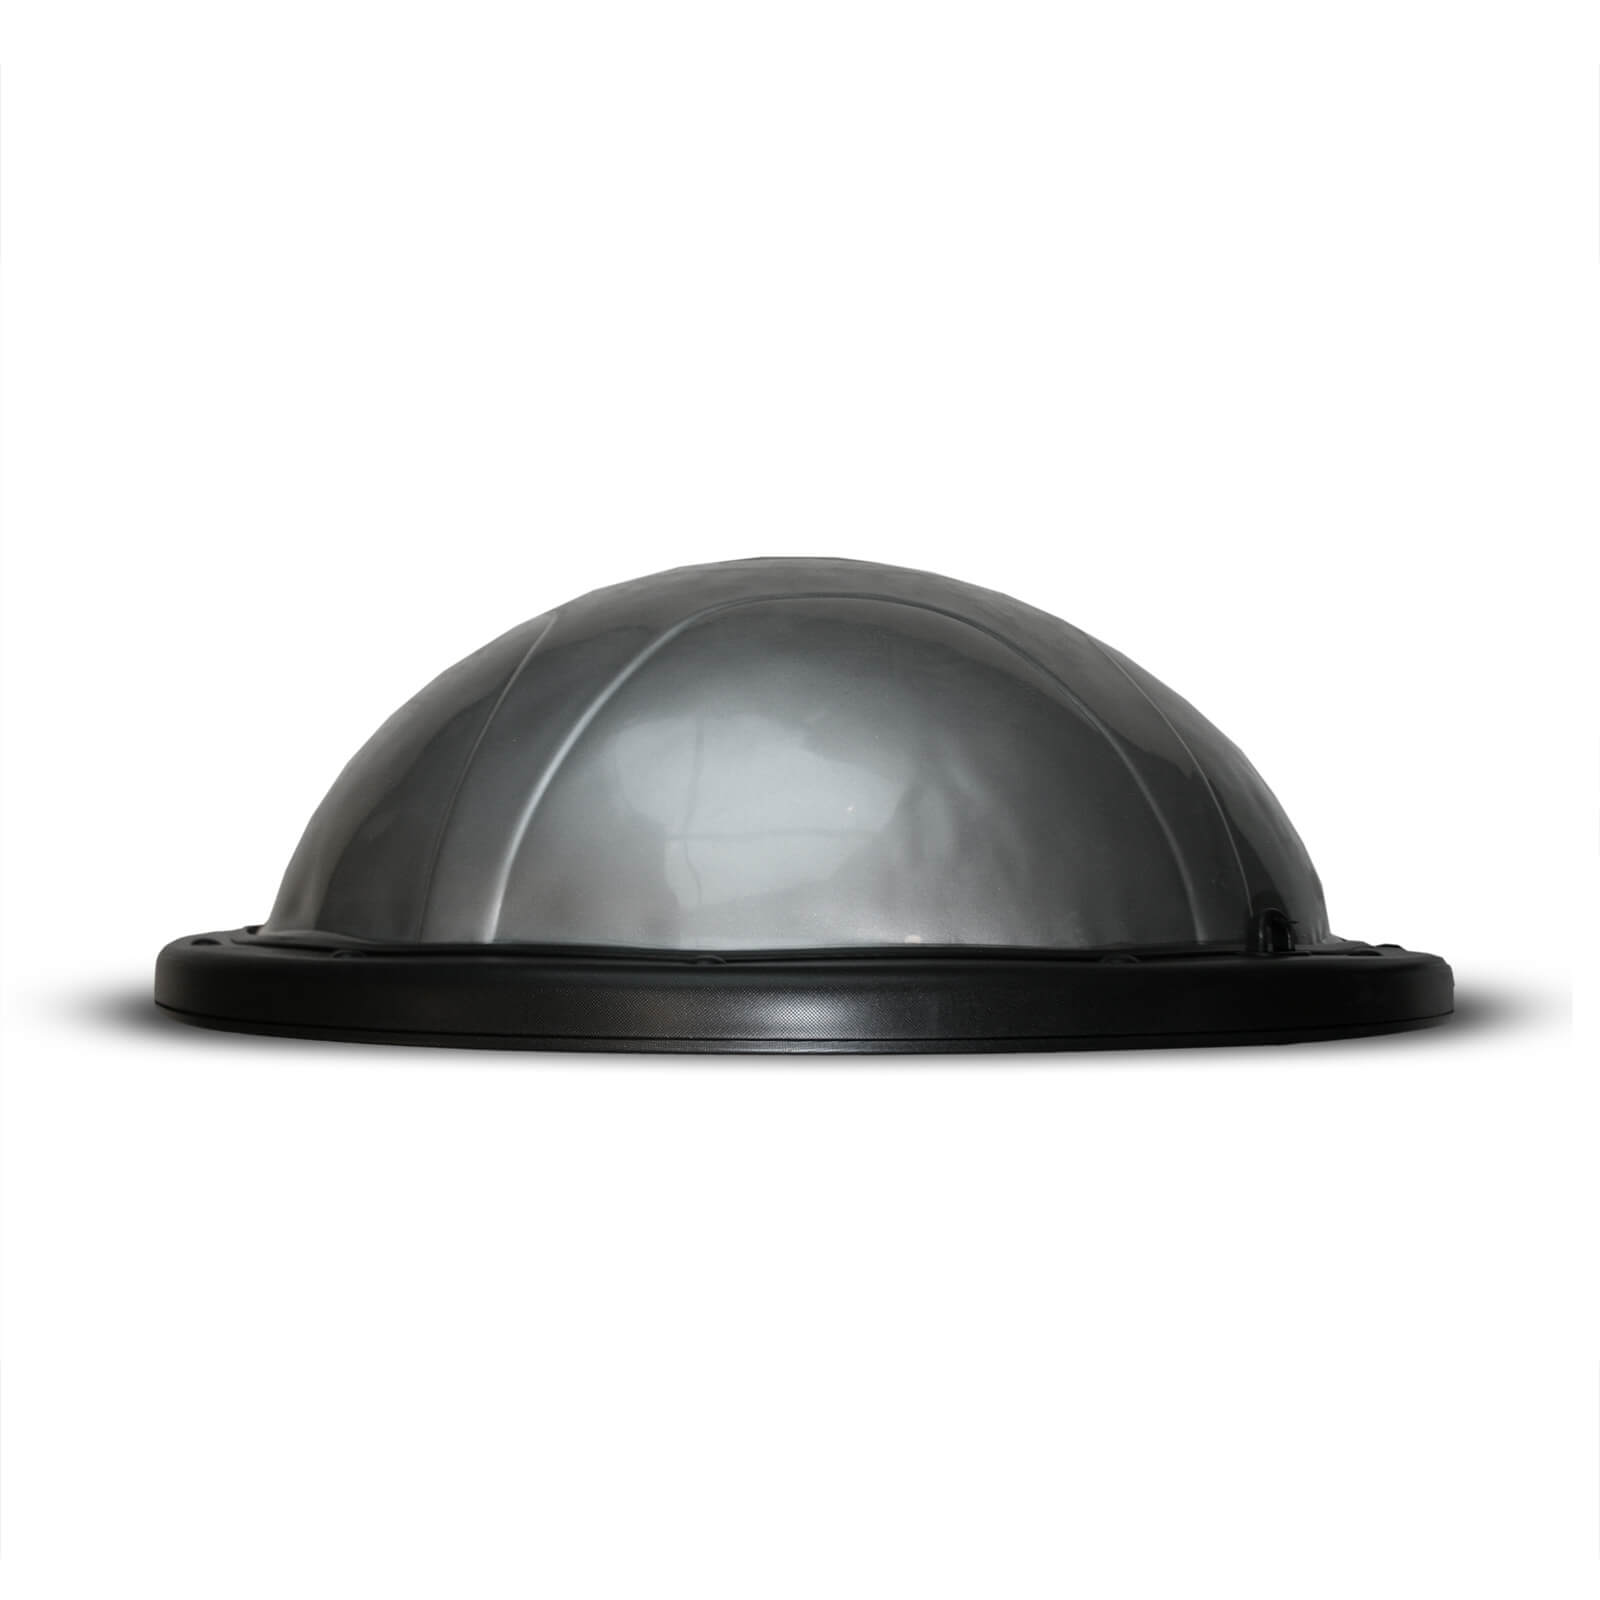 Icke gamla Köp Balance Ball Pro, JTC Fitness online hos Sportgymbutiken.se TD-85